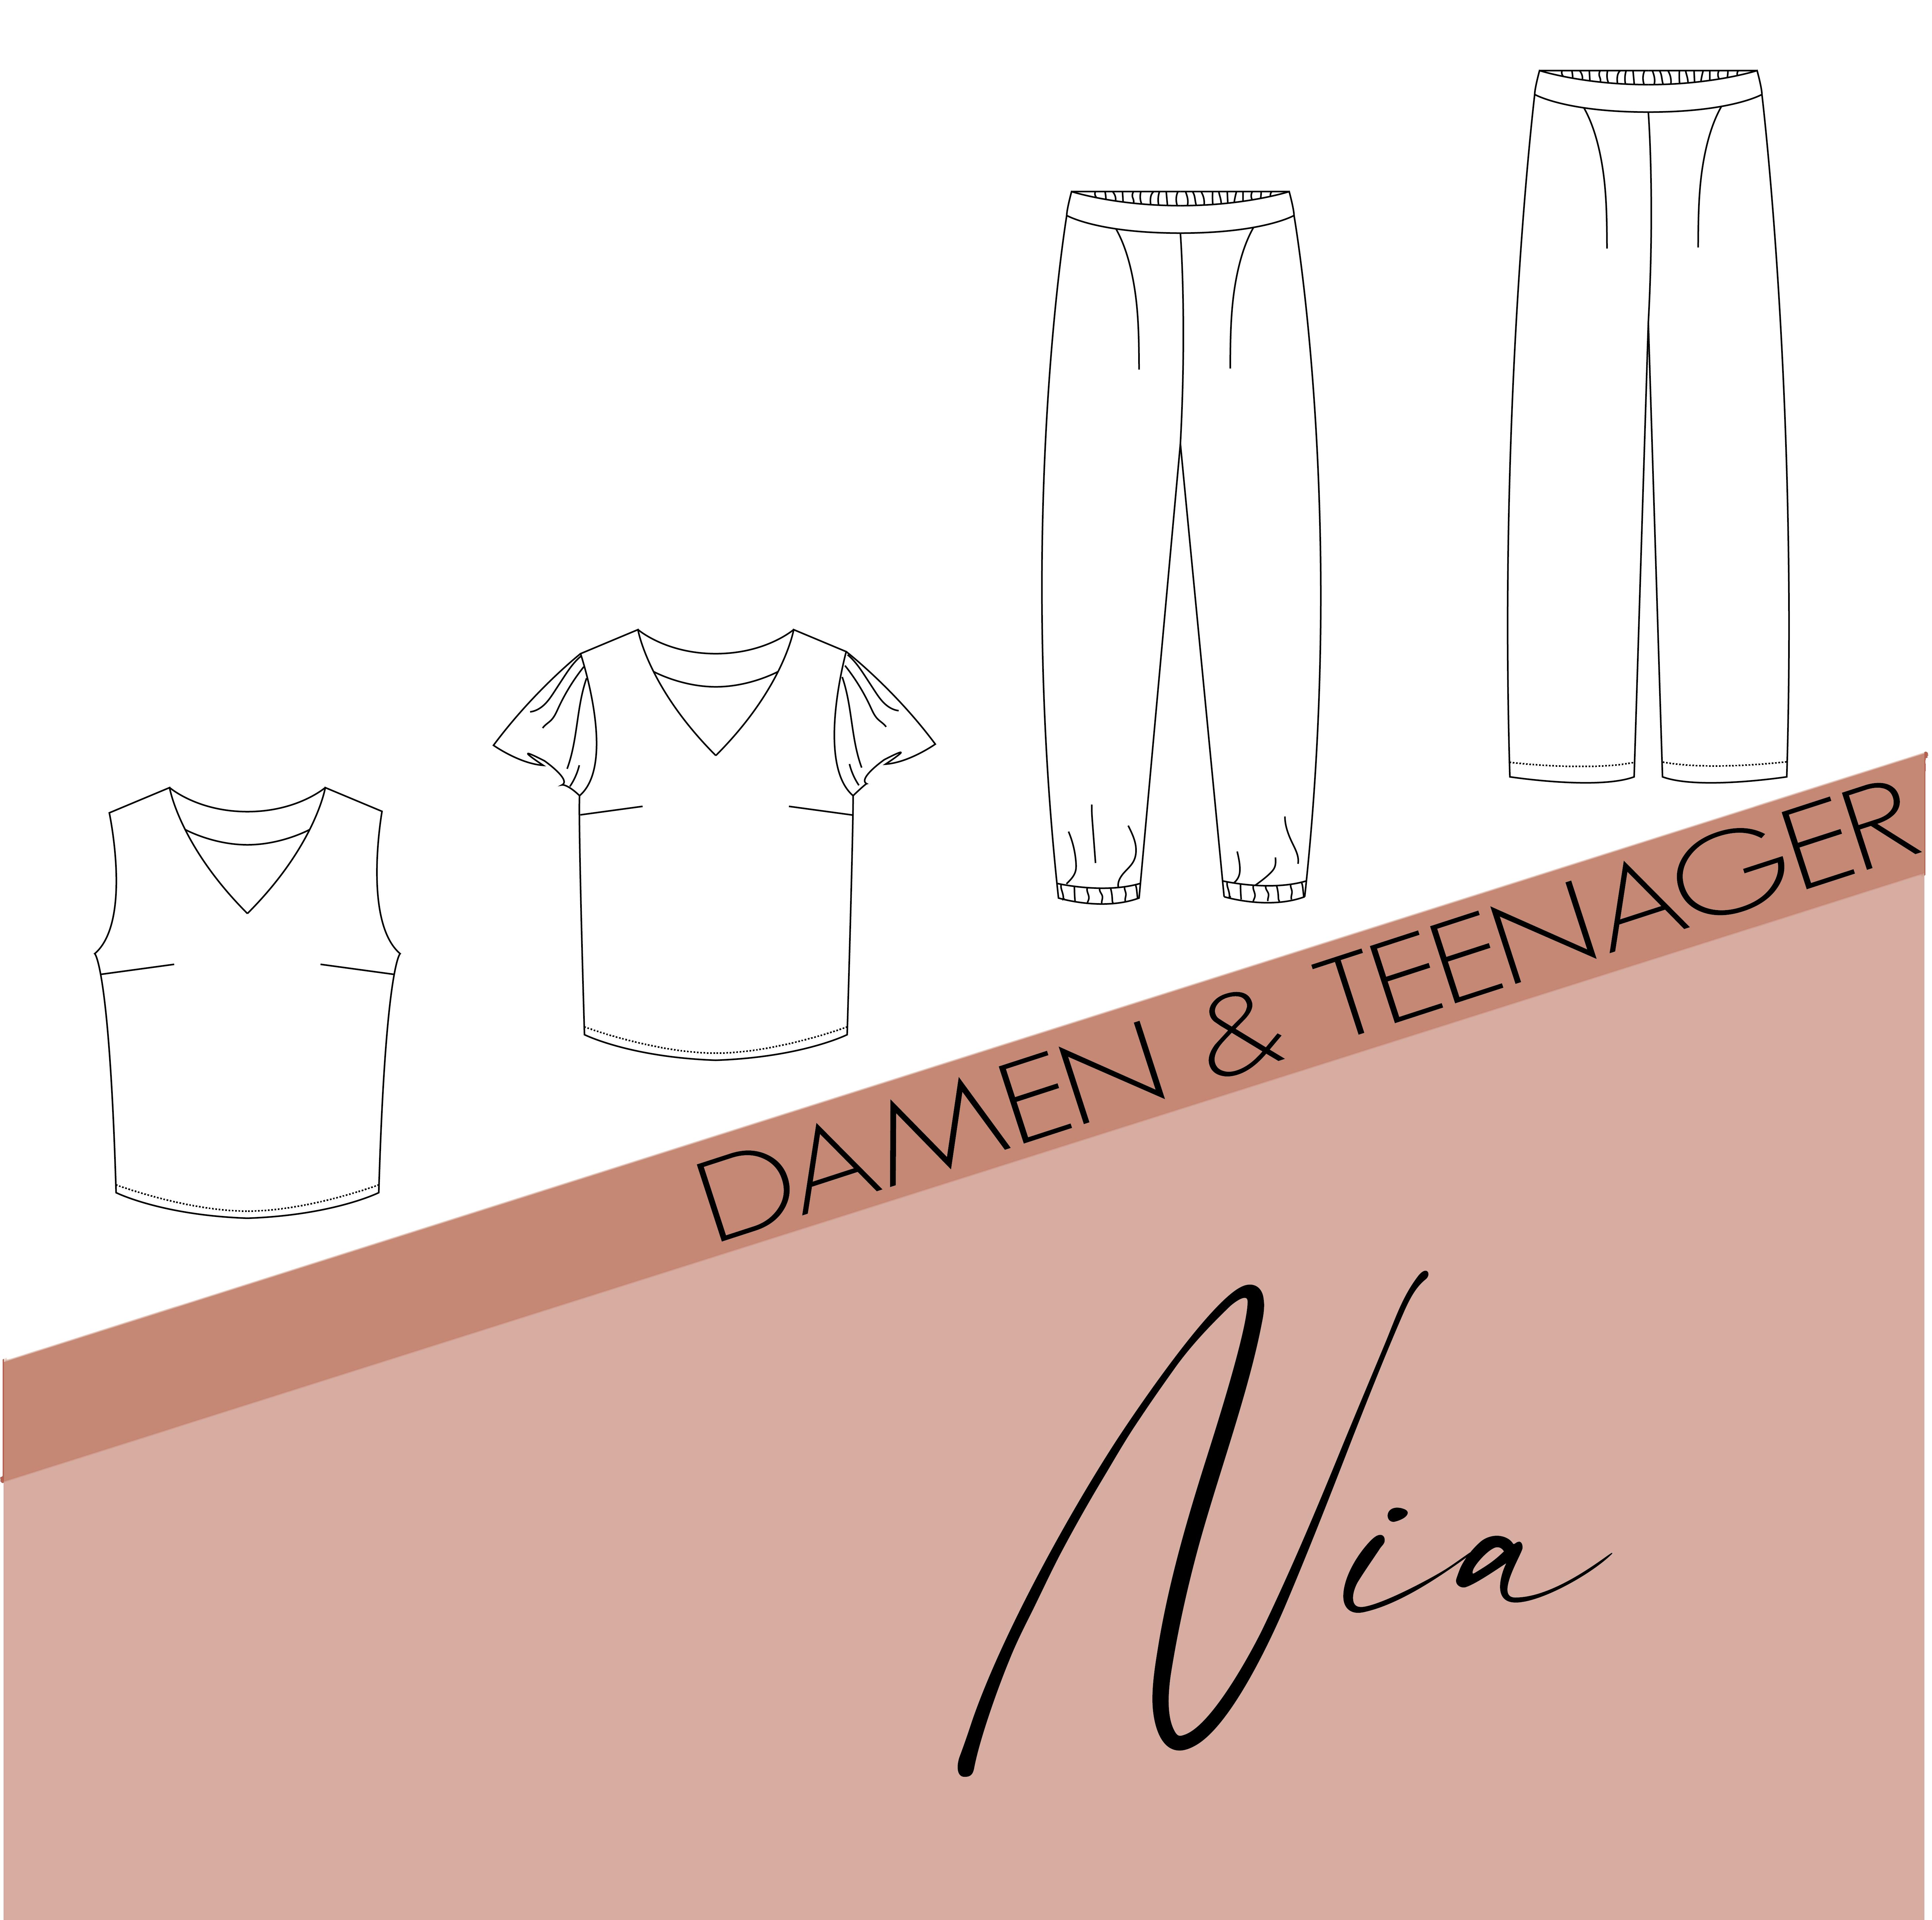 Nia - Damen & Teenager